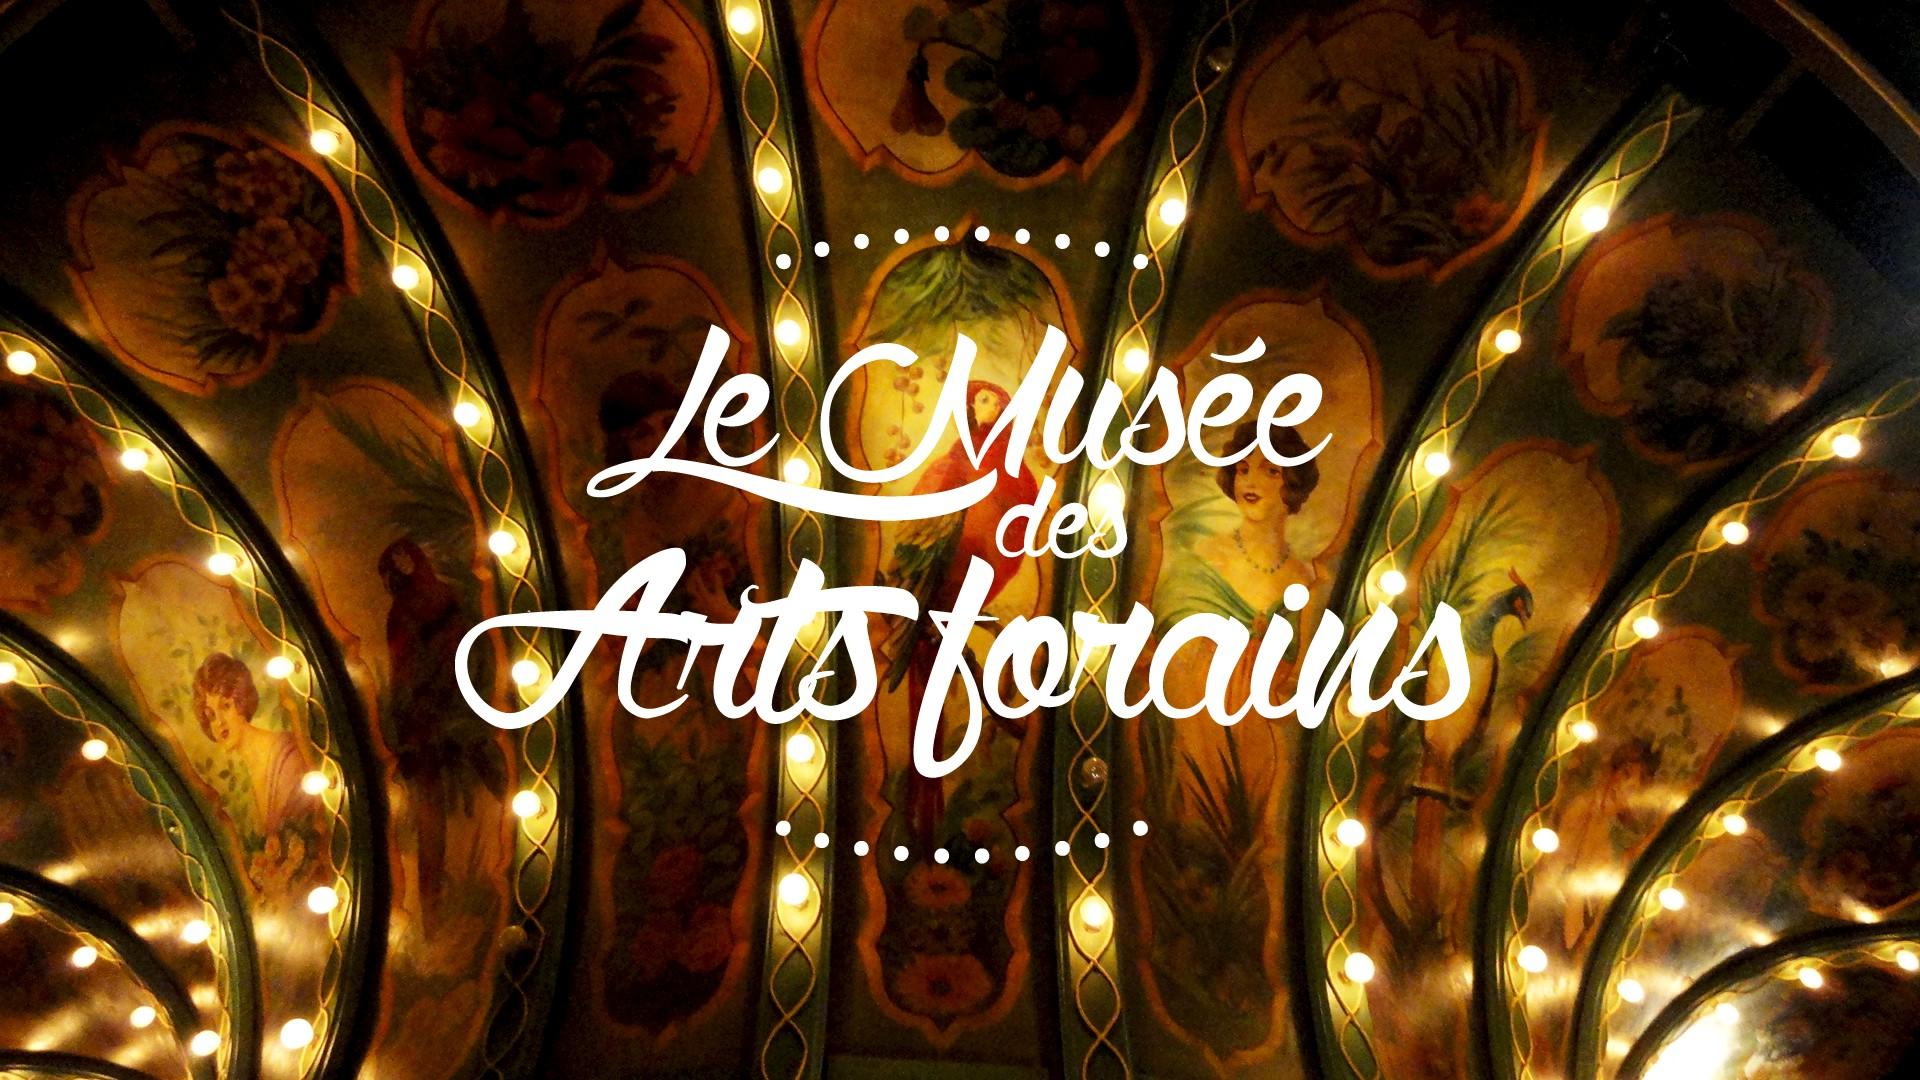 20150110_musee_arts_forains_paris (Large)